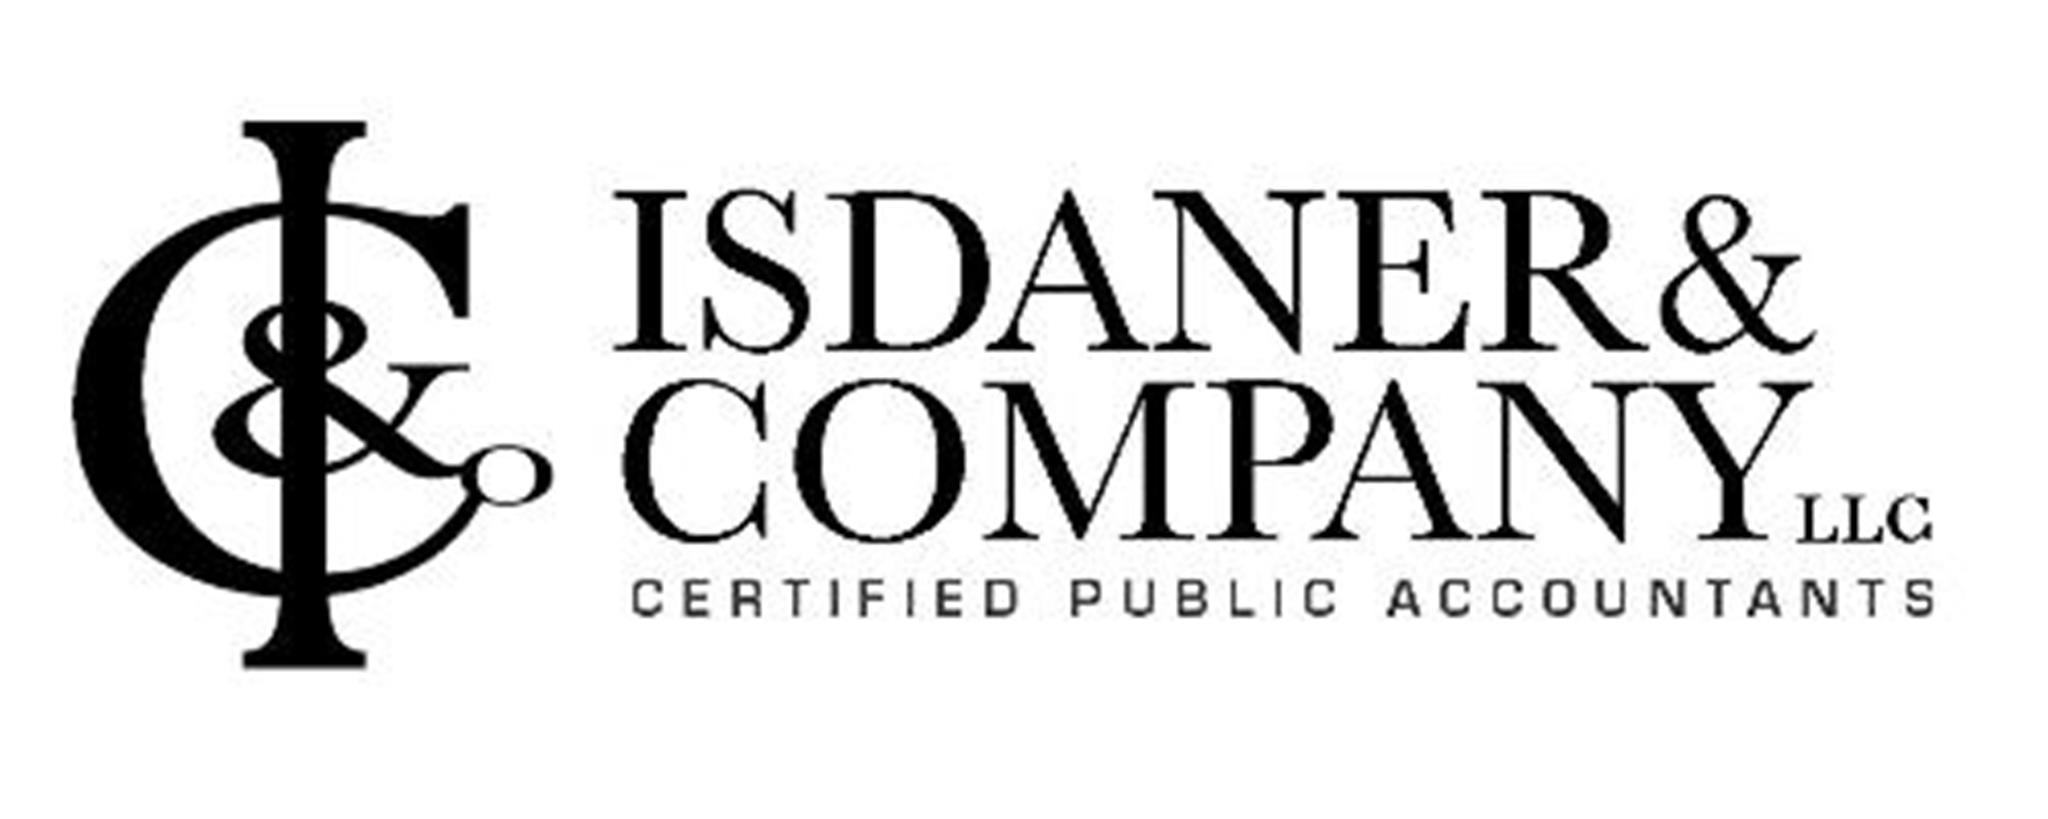 Isdaner & Company, LLC logo